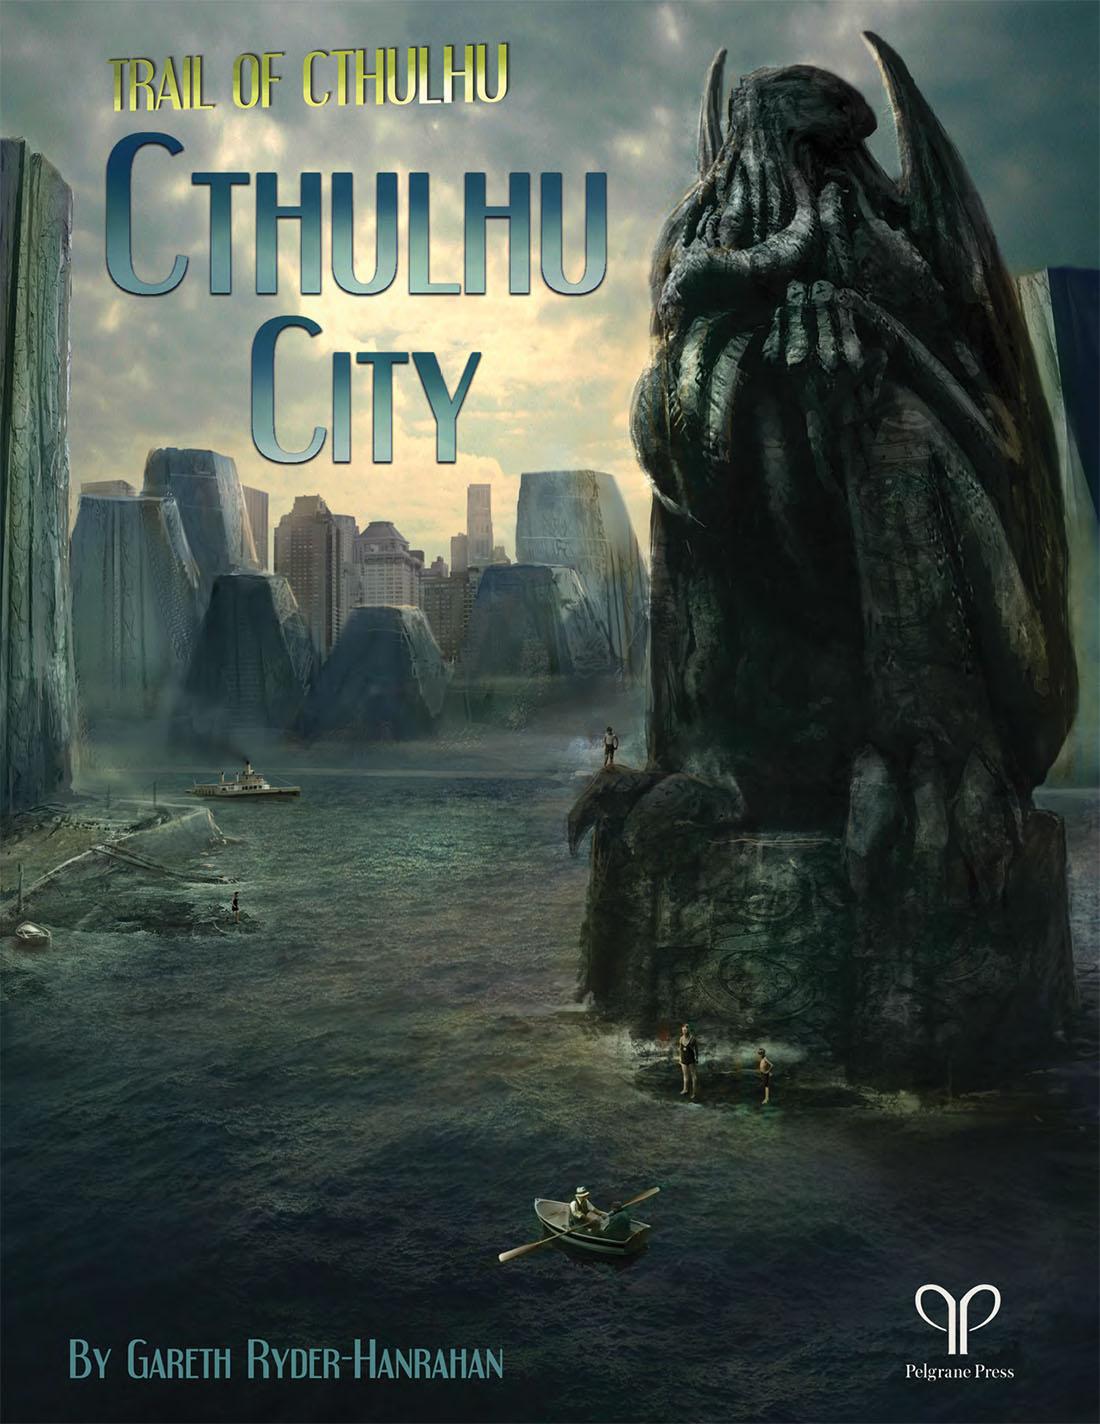 Cthulhu City - Gareth Ryder-Hanrahan